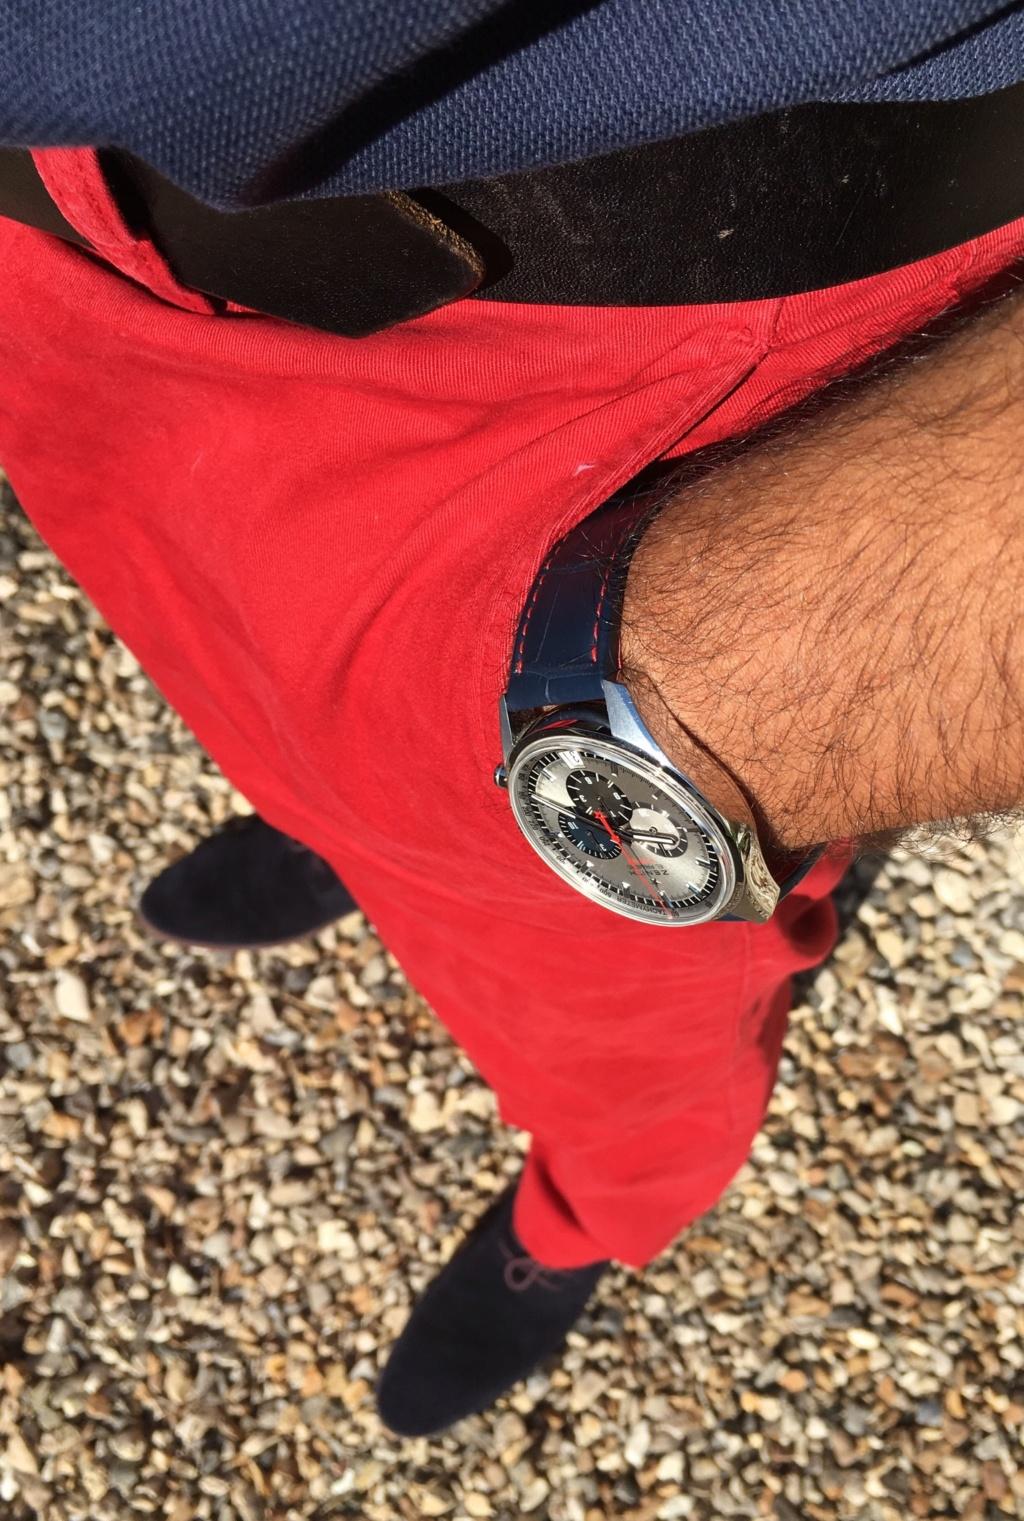 Le wrist-pocket-shoe wear topic multi-marques [tome IV] - Page 4 C9138210